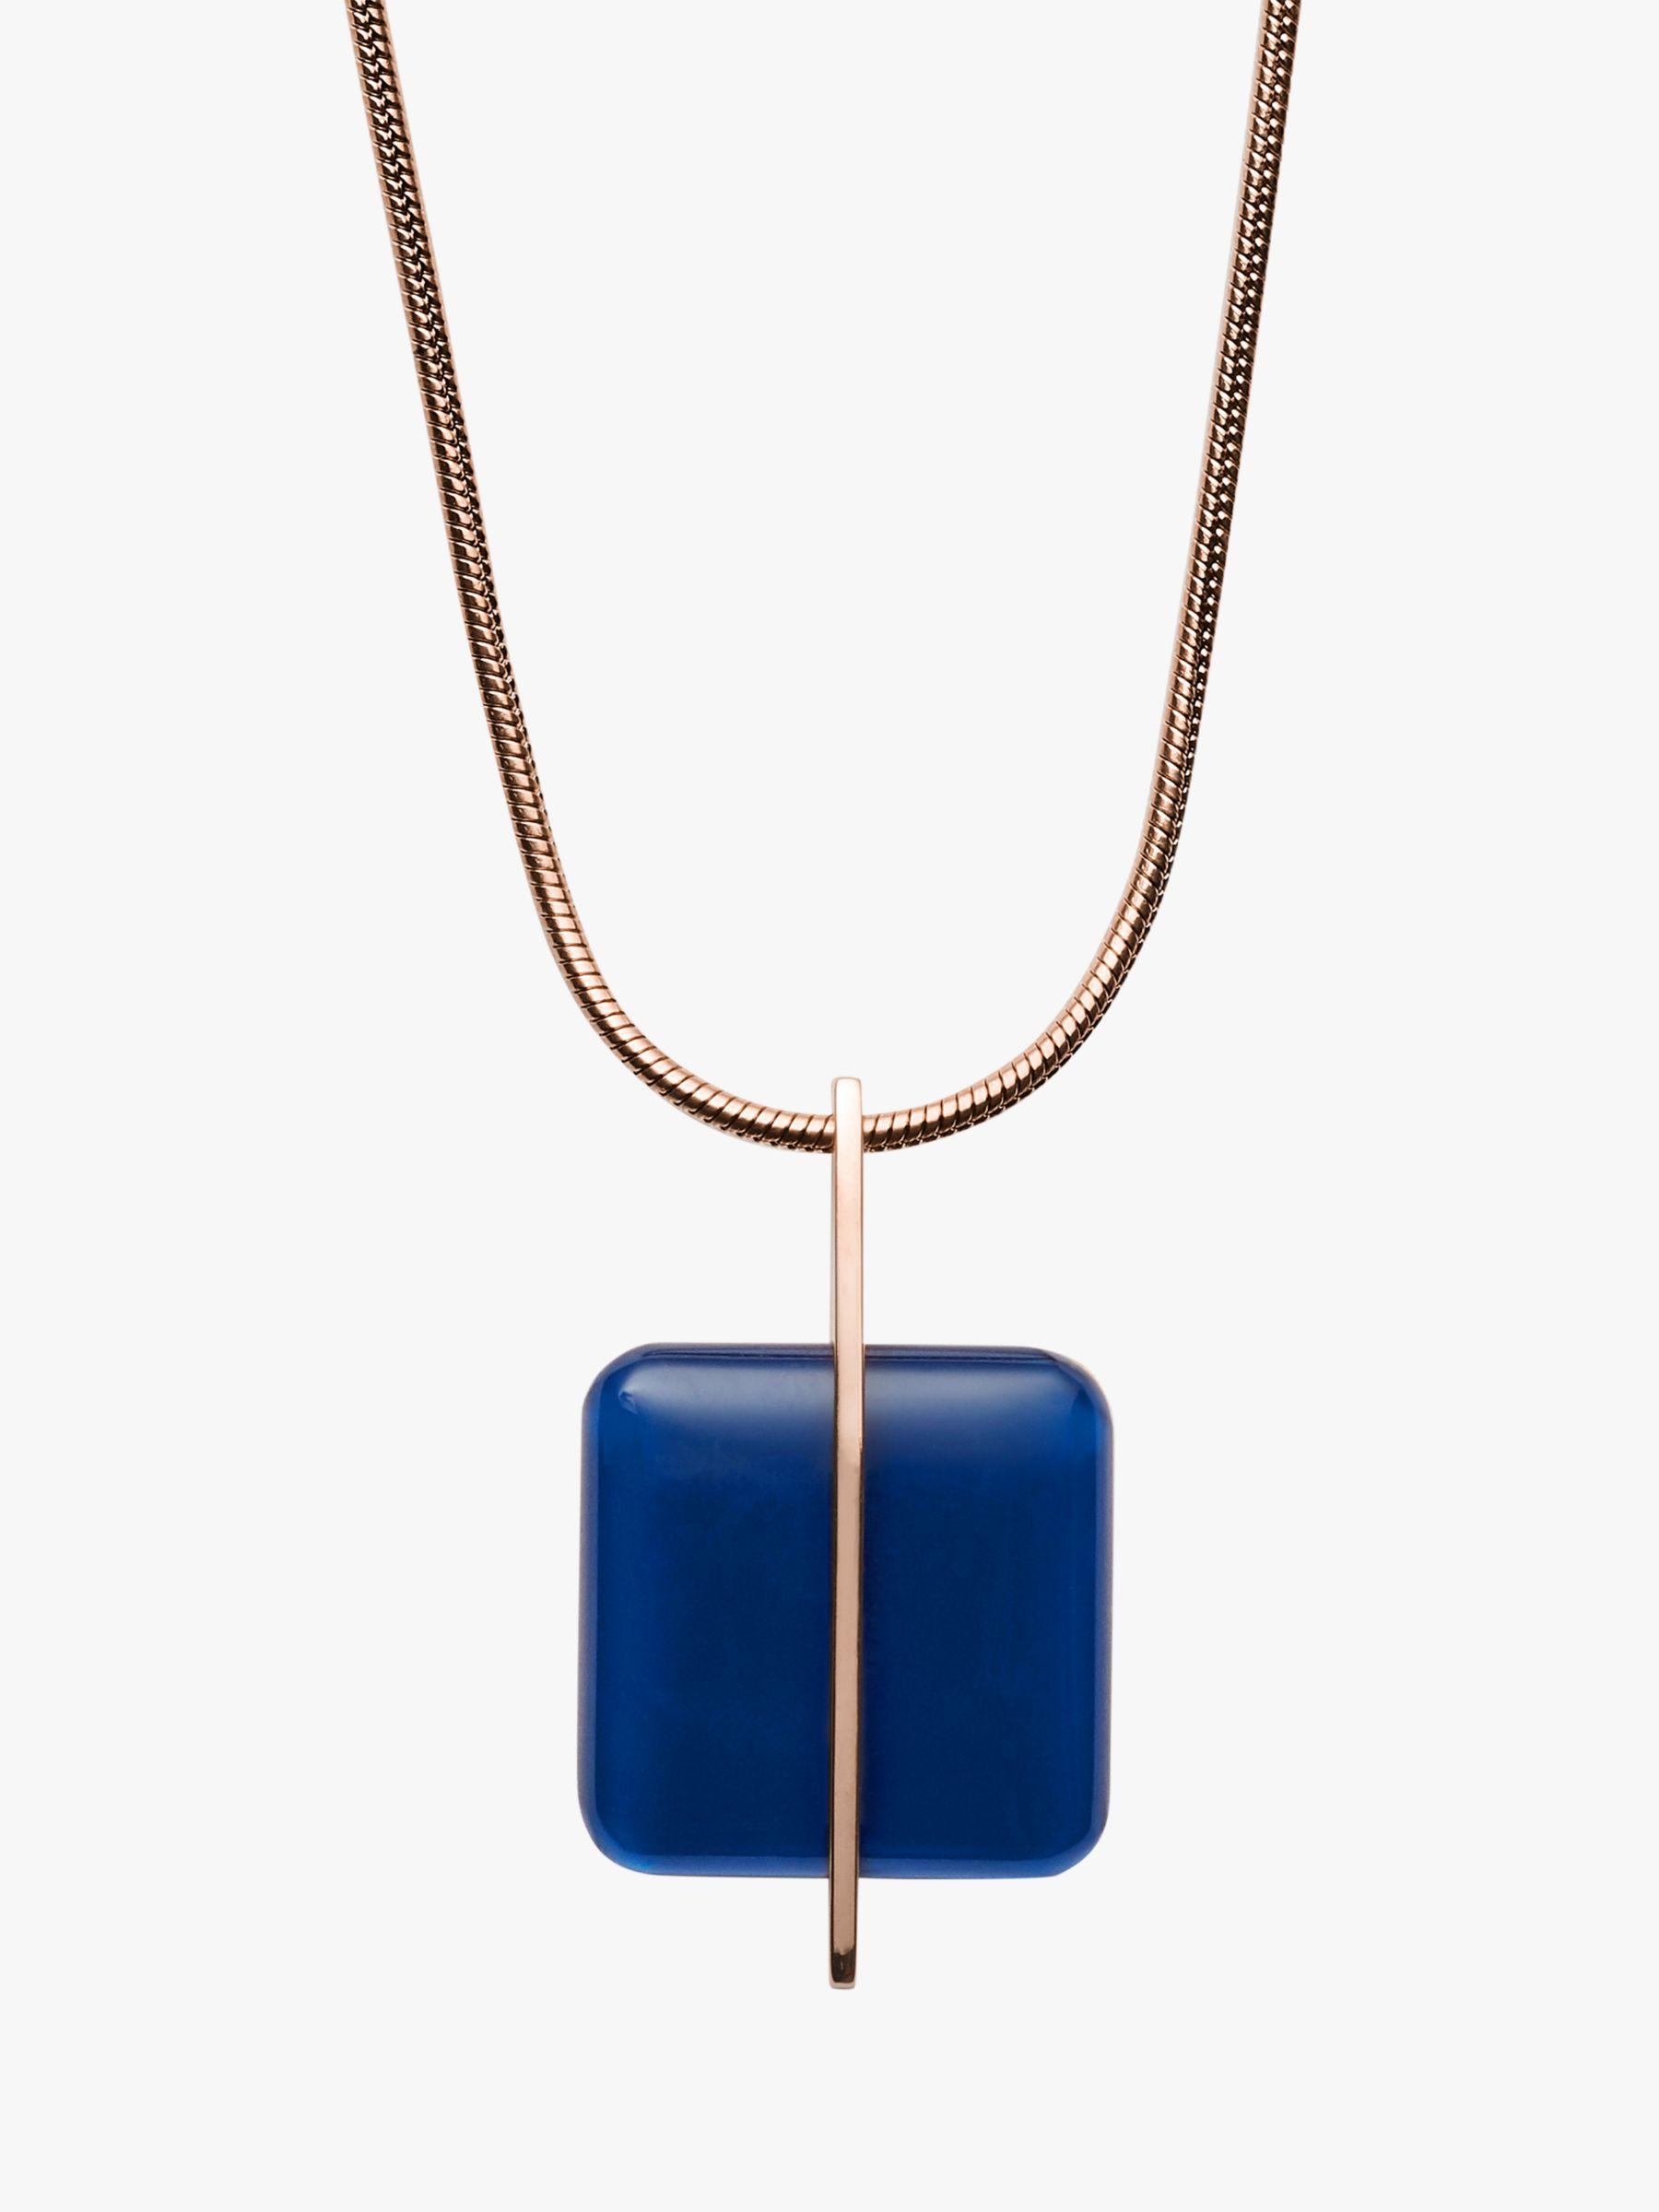 skagen Skagen Seaglass Pendant Necklace, Rose Gold/Blue SKJ1134791